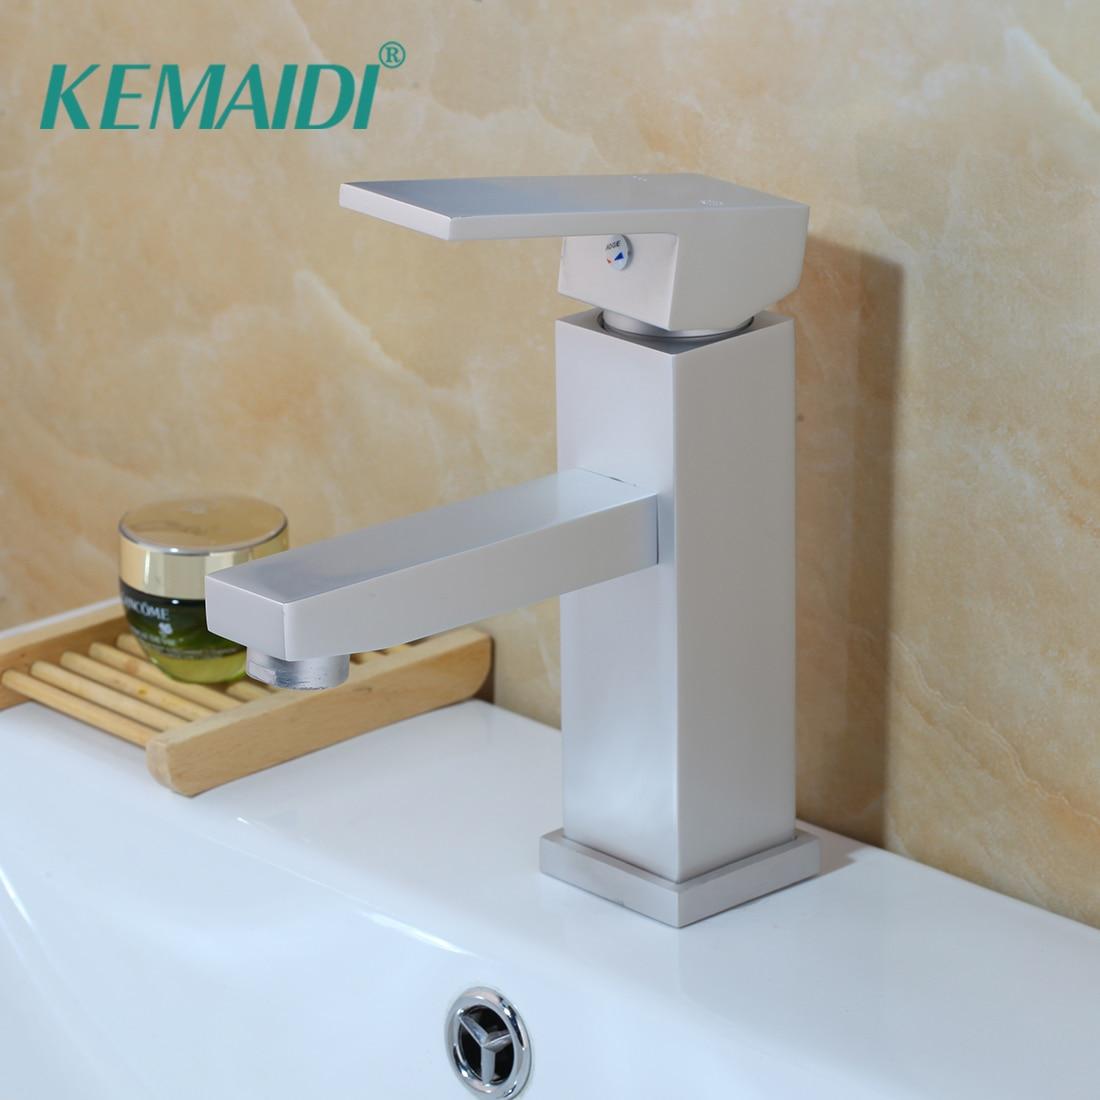 Permalink to KEMAIDI Bathroom Single Handle Sink Faucet Basin Mixer Tap Deck Mounted Faucet Accessory Bathroom Faucets